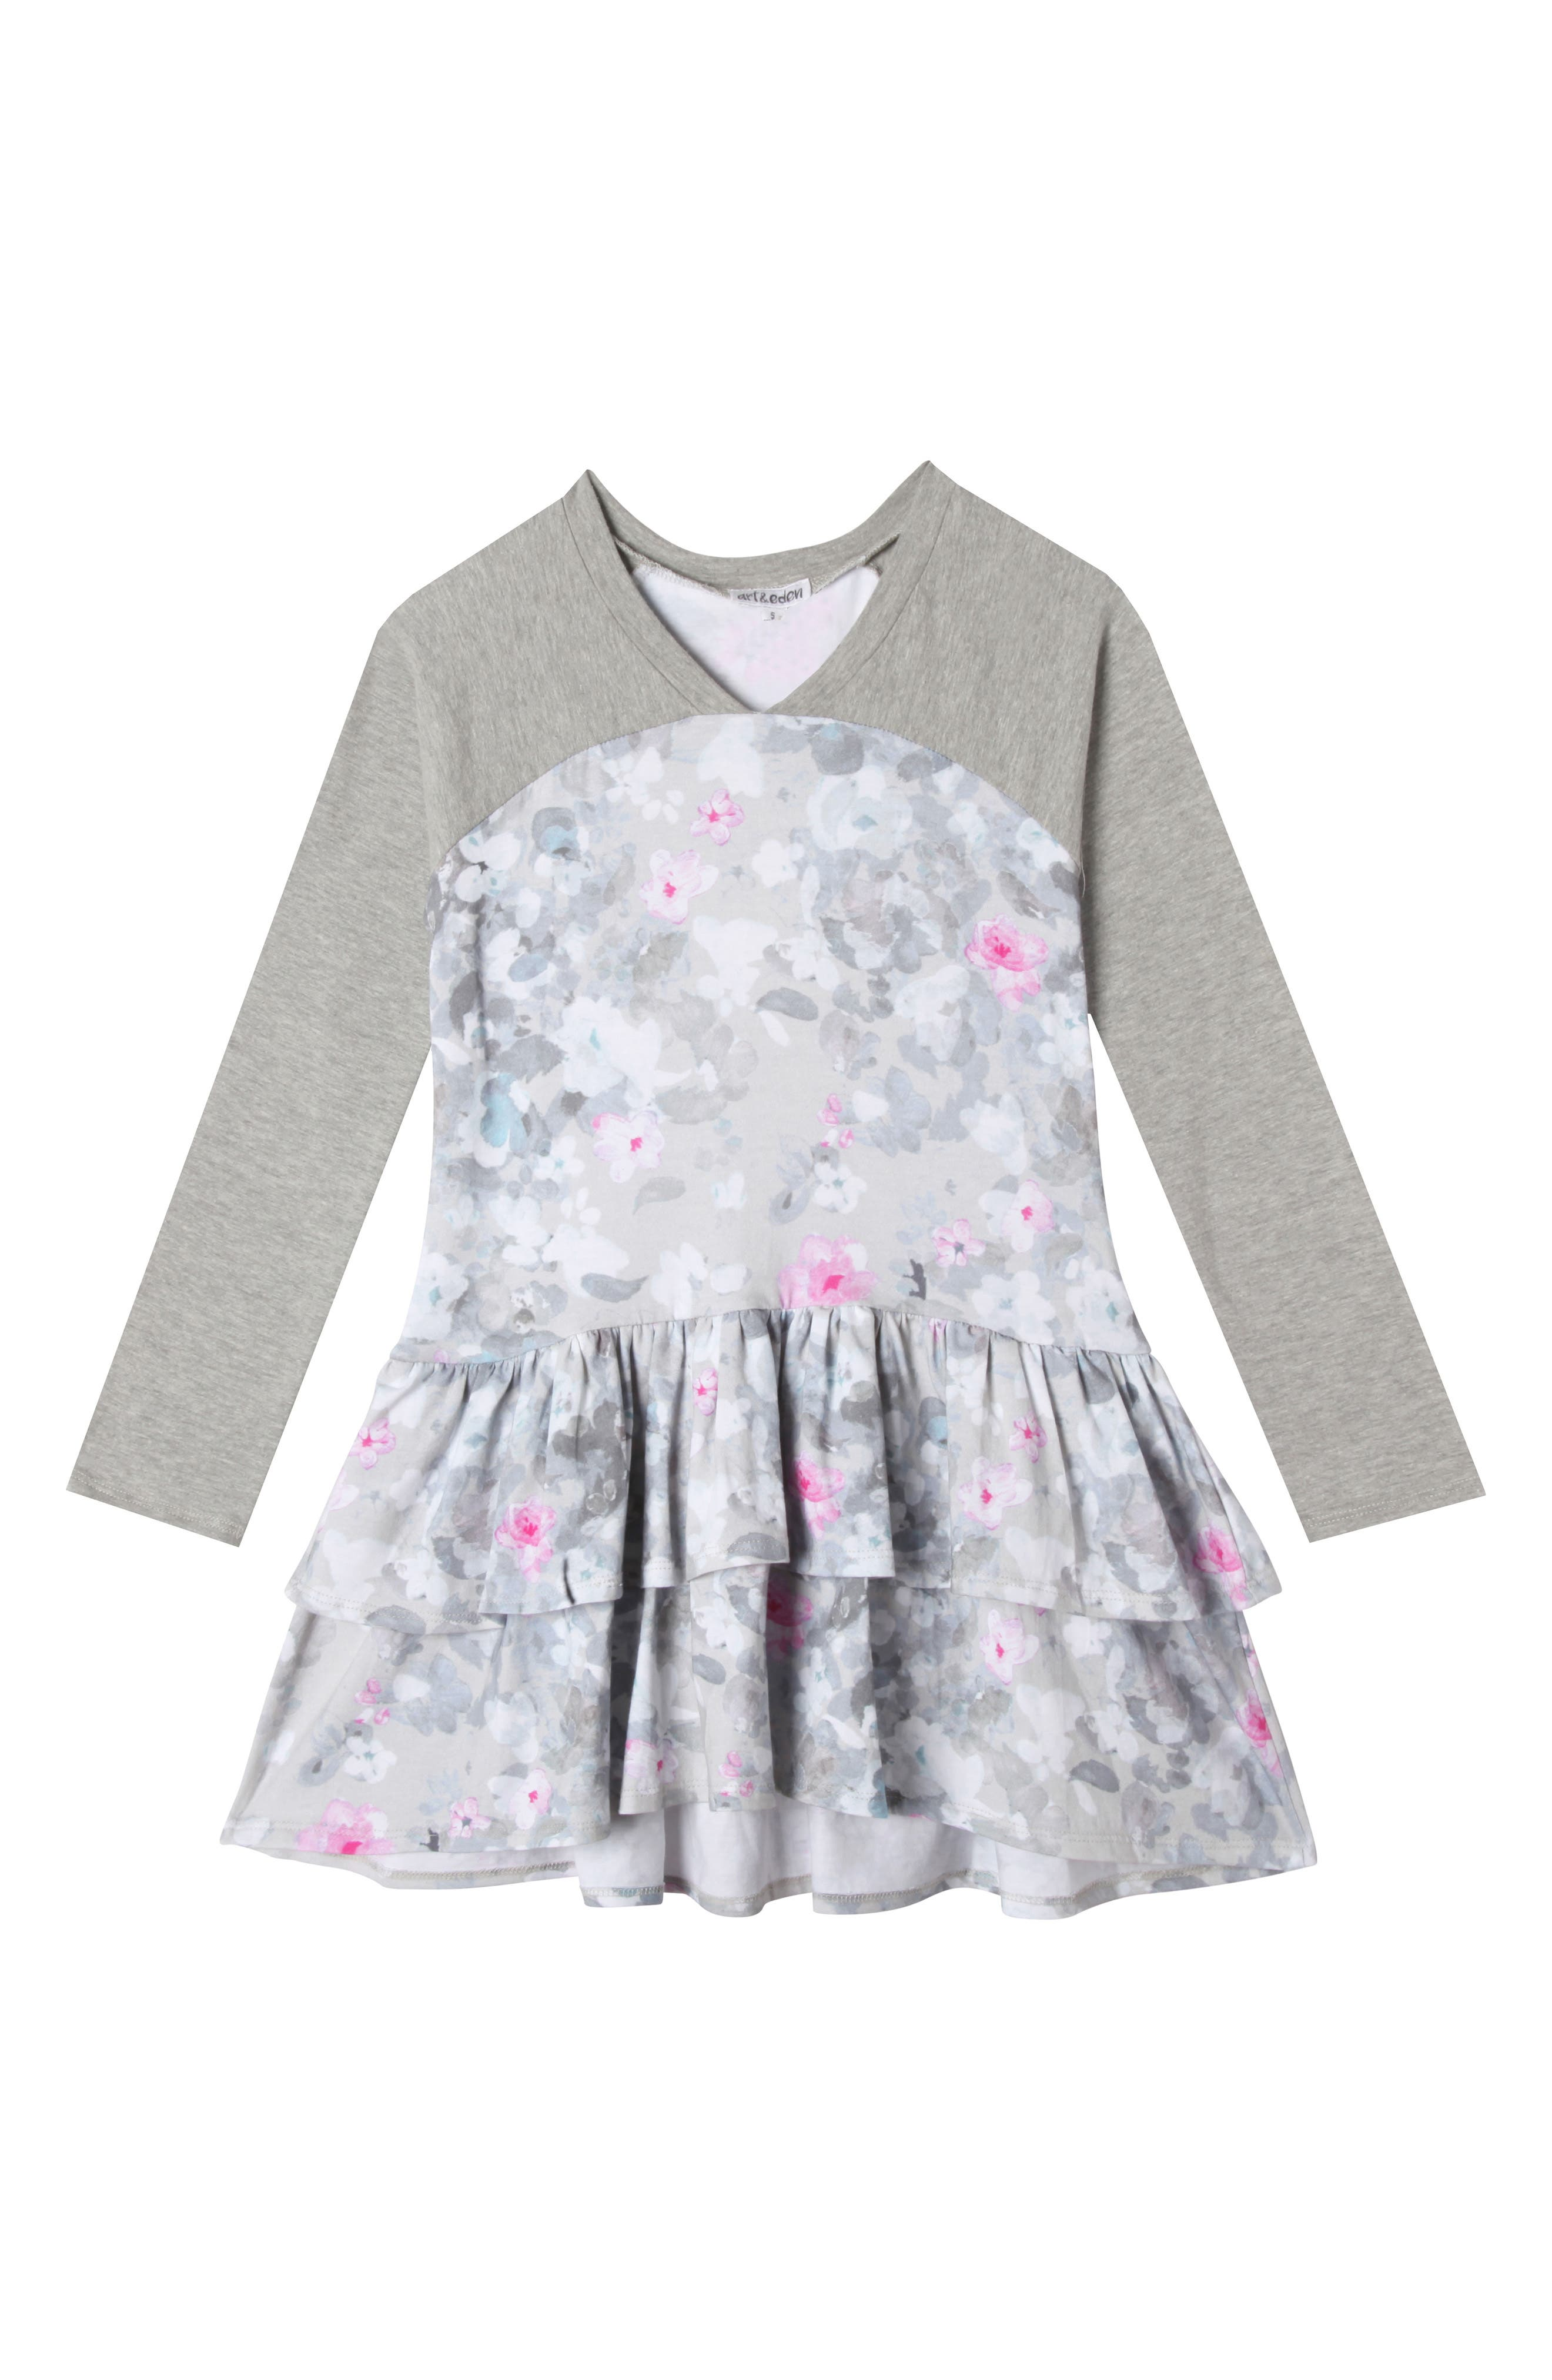 Main Image - Art & Eden Julia Dress (Toddler Girls & Little Girls)